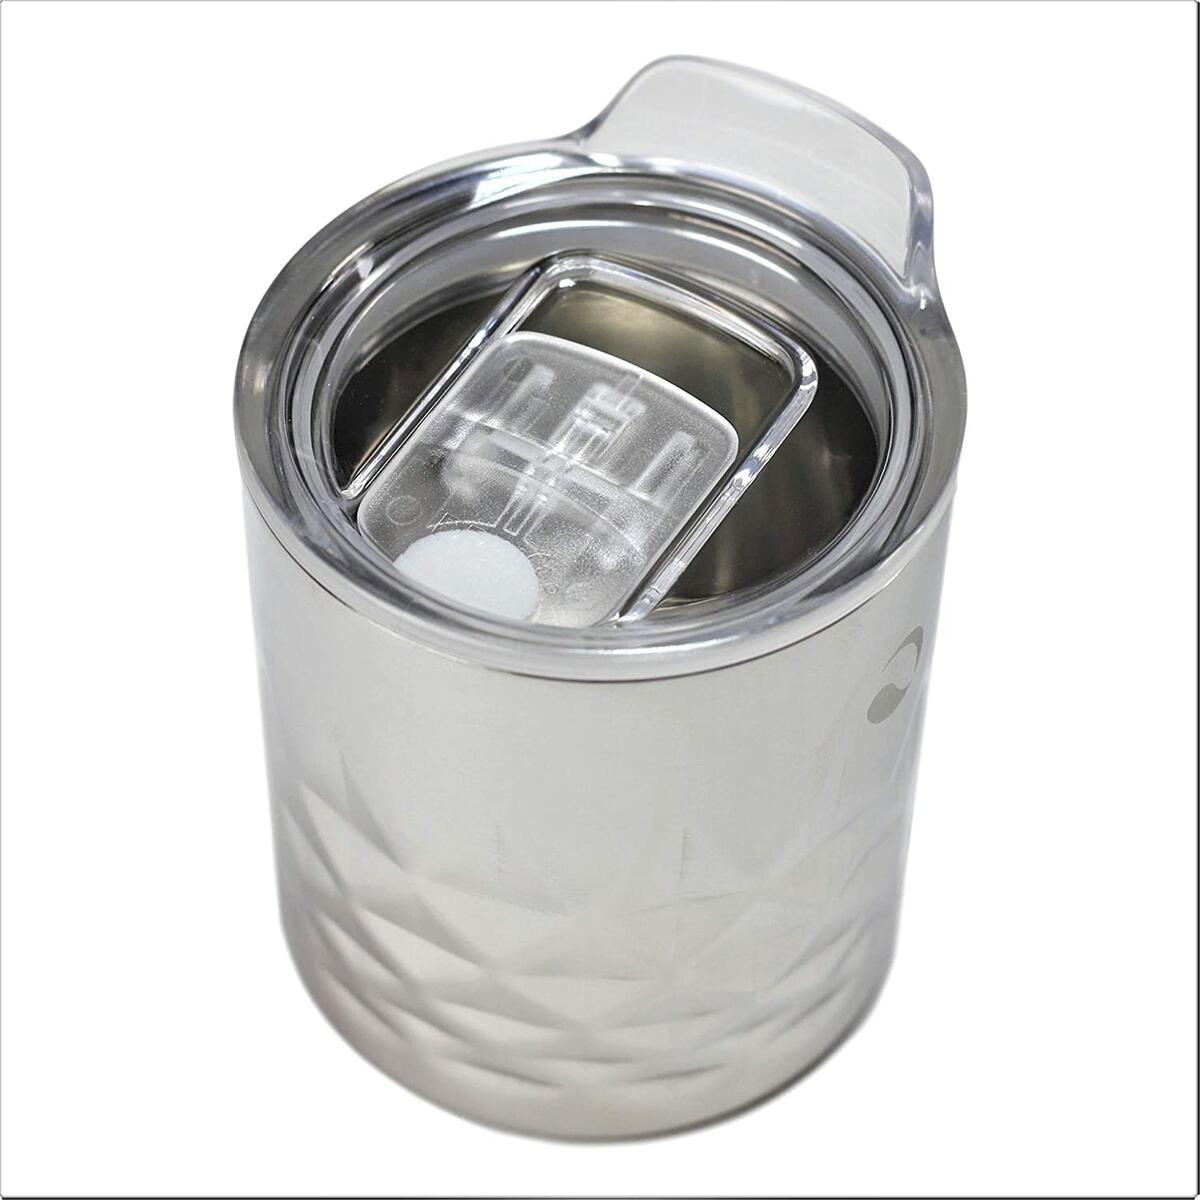 DRINCO- 10oz Stainless Steel Tumbler, Vacuum Insulated Tumbler Whiskey Glass, Rocks Glass, GULT (10oz Whiskey Tumbler, Diamond)